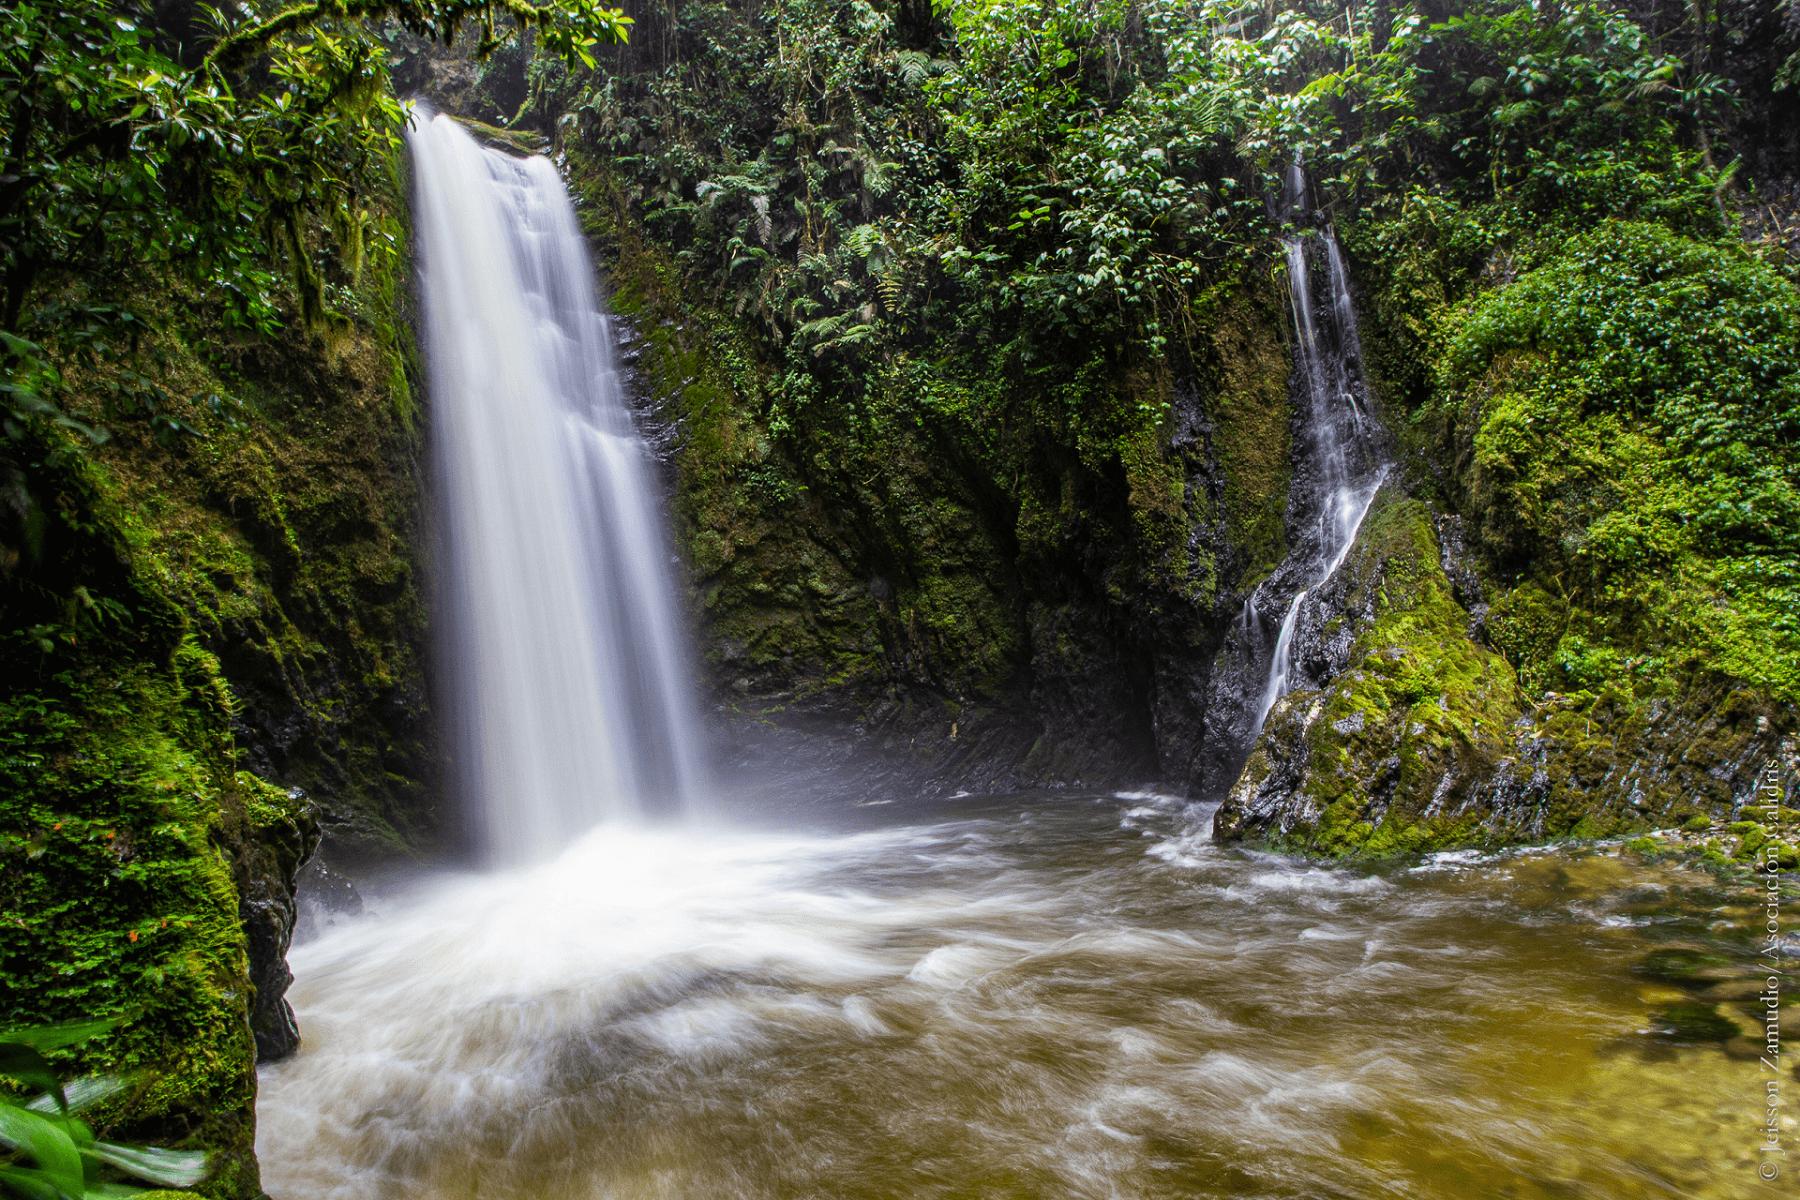 The Paraguas-Munchique forest is home to 741 bird species © Jeisson Zamudio / Asociación Calidris